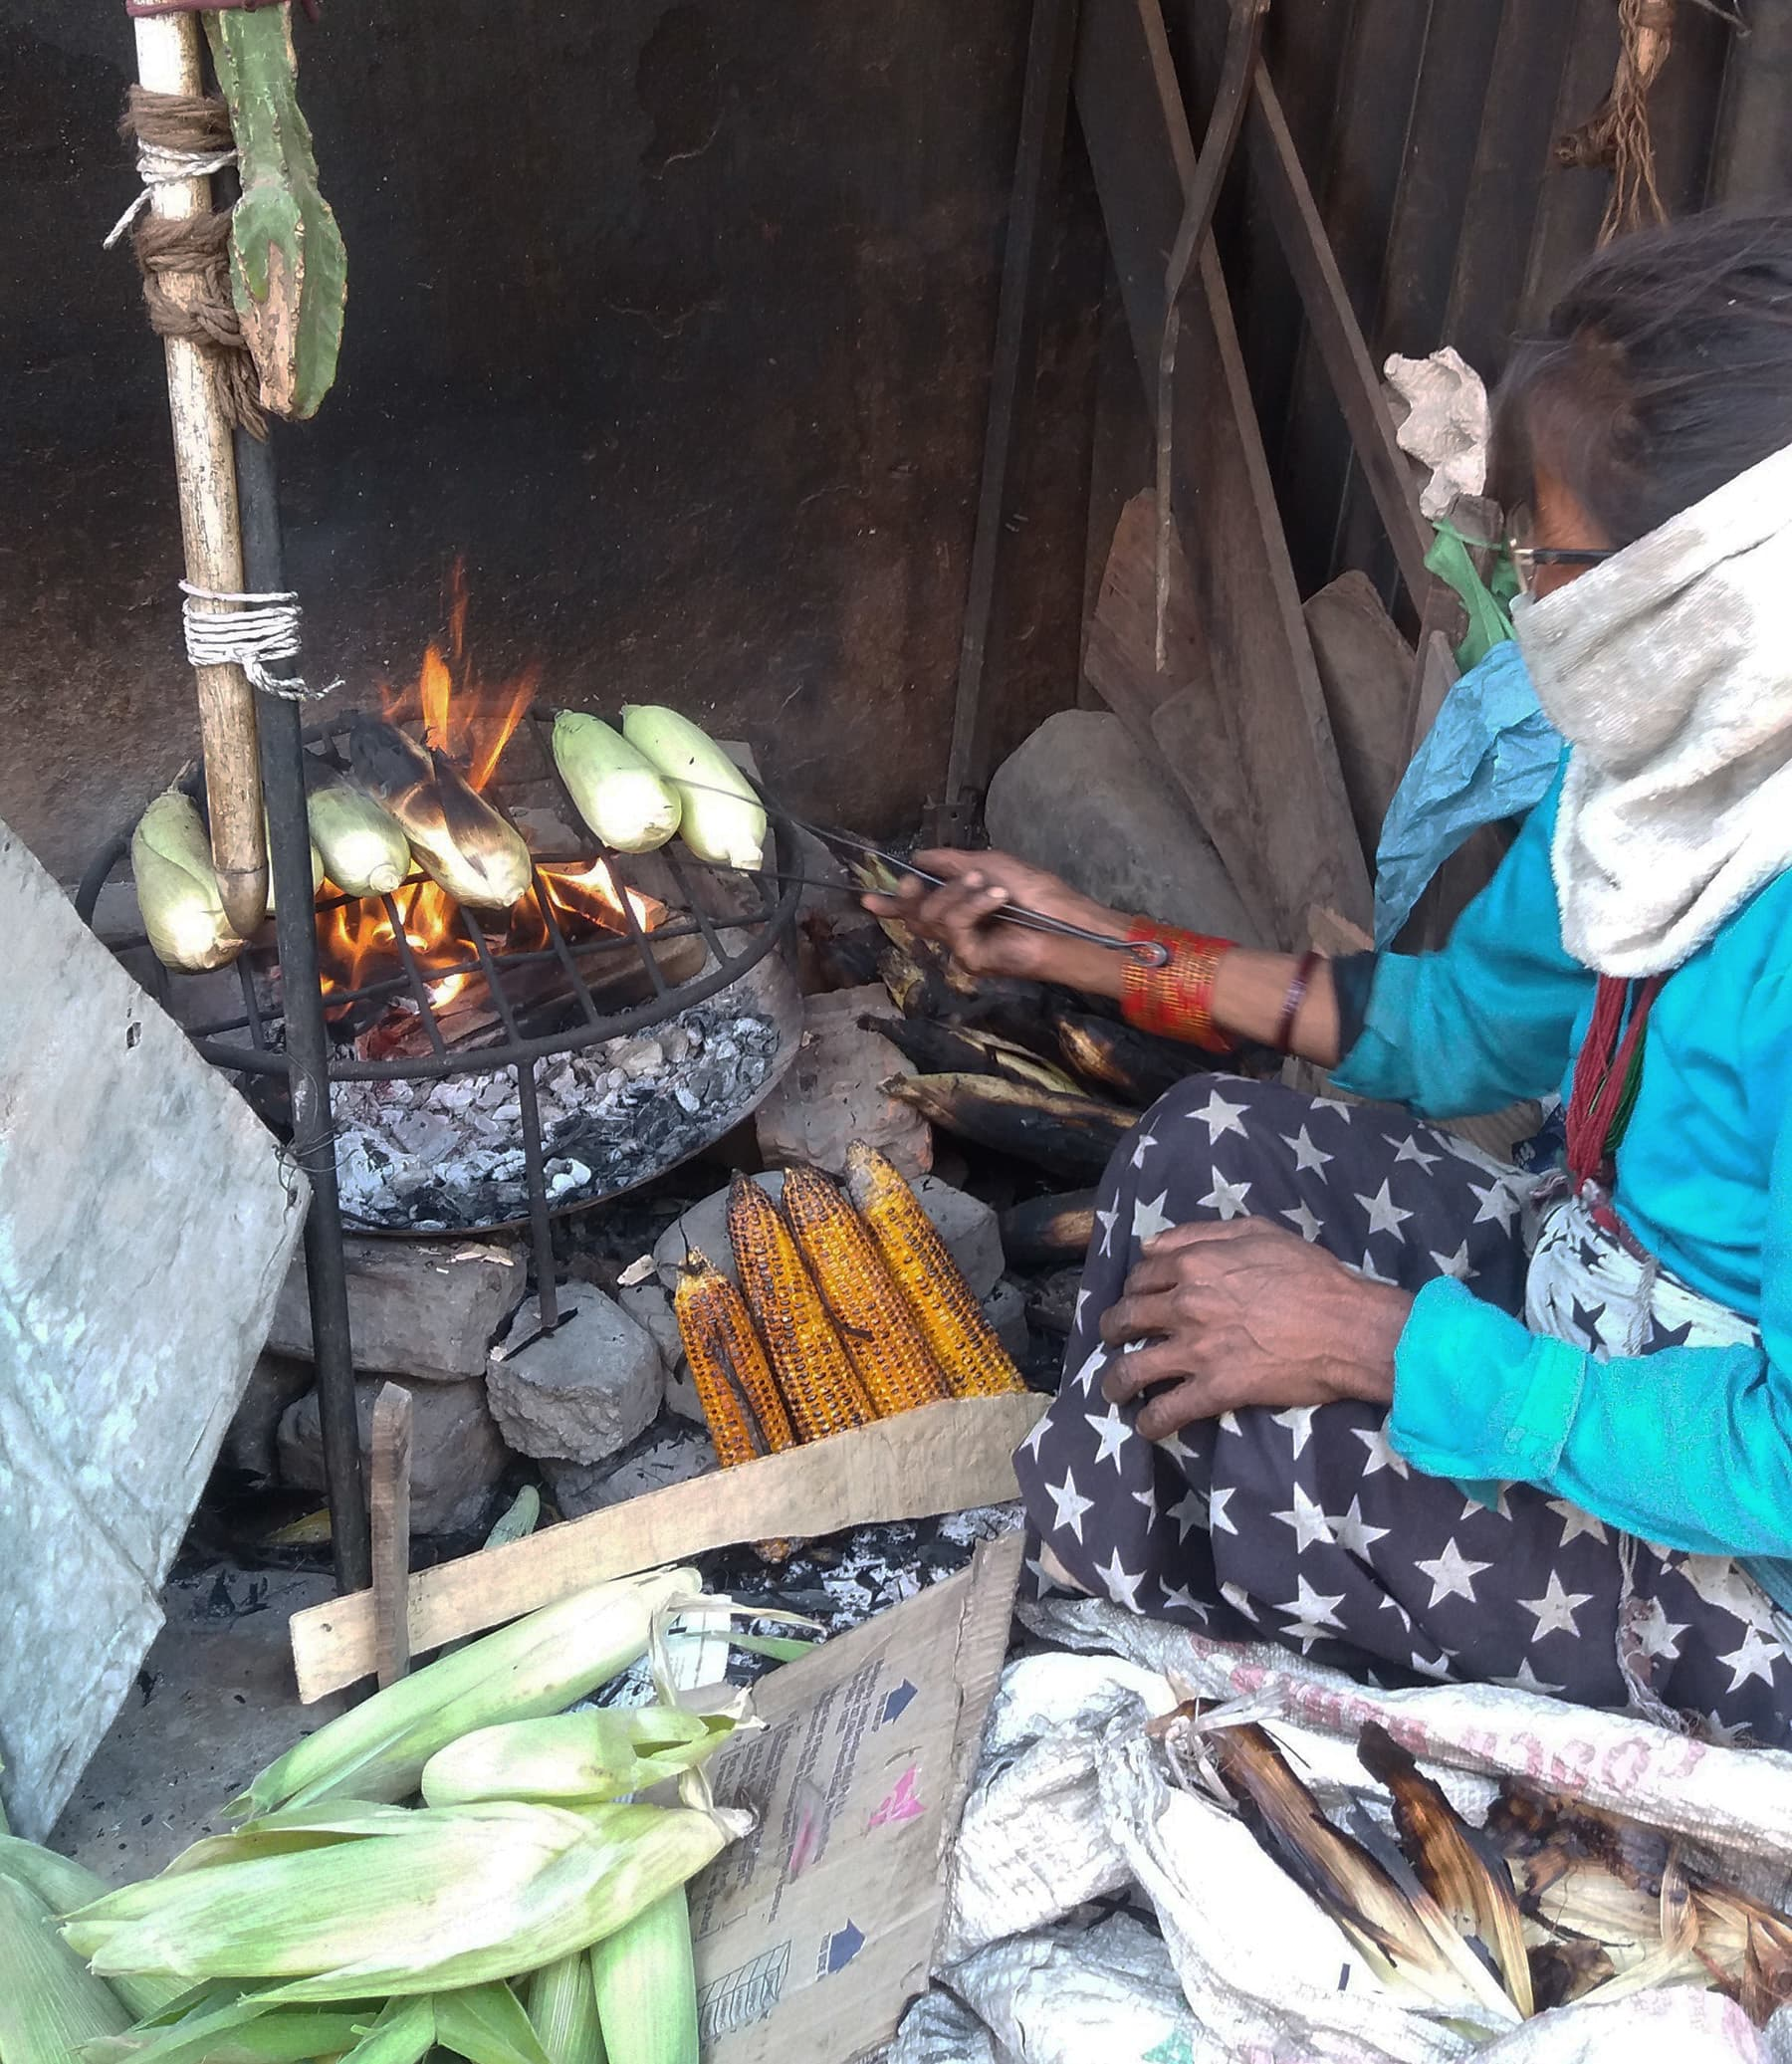 بھٹہ بیچ رہی ایک نیپالی خاتون—تصویر شبینہ فراز